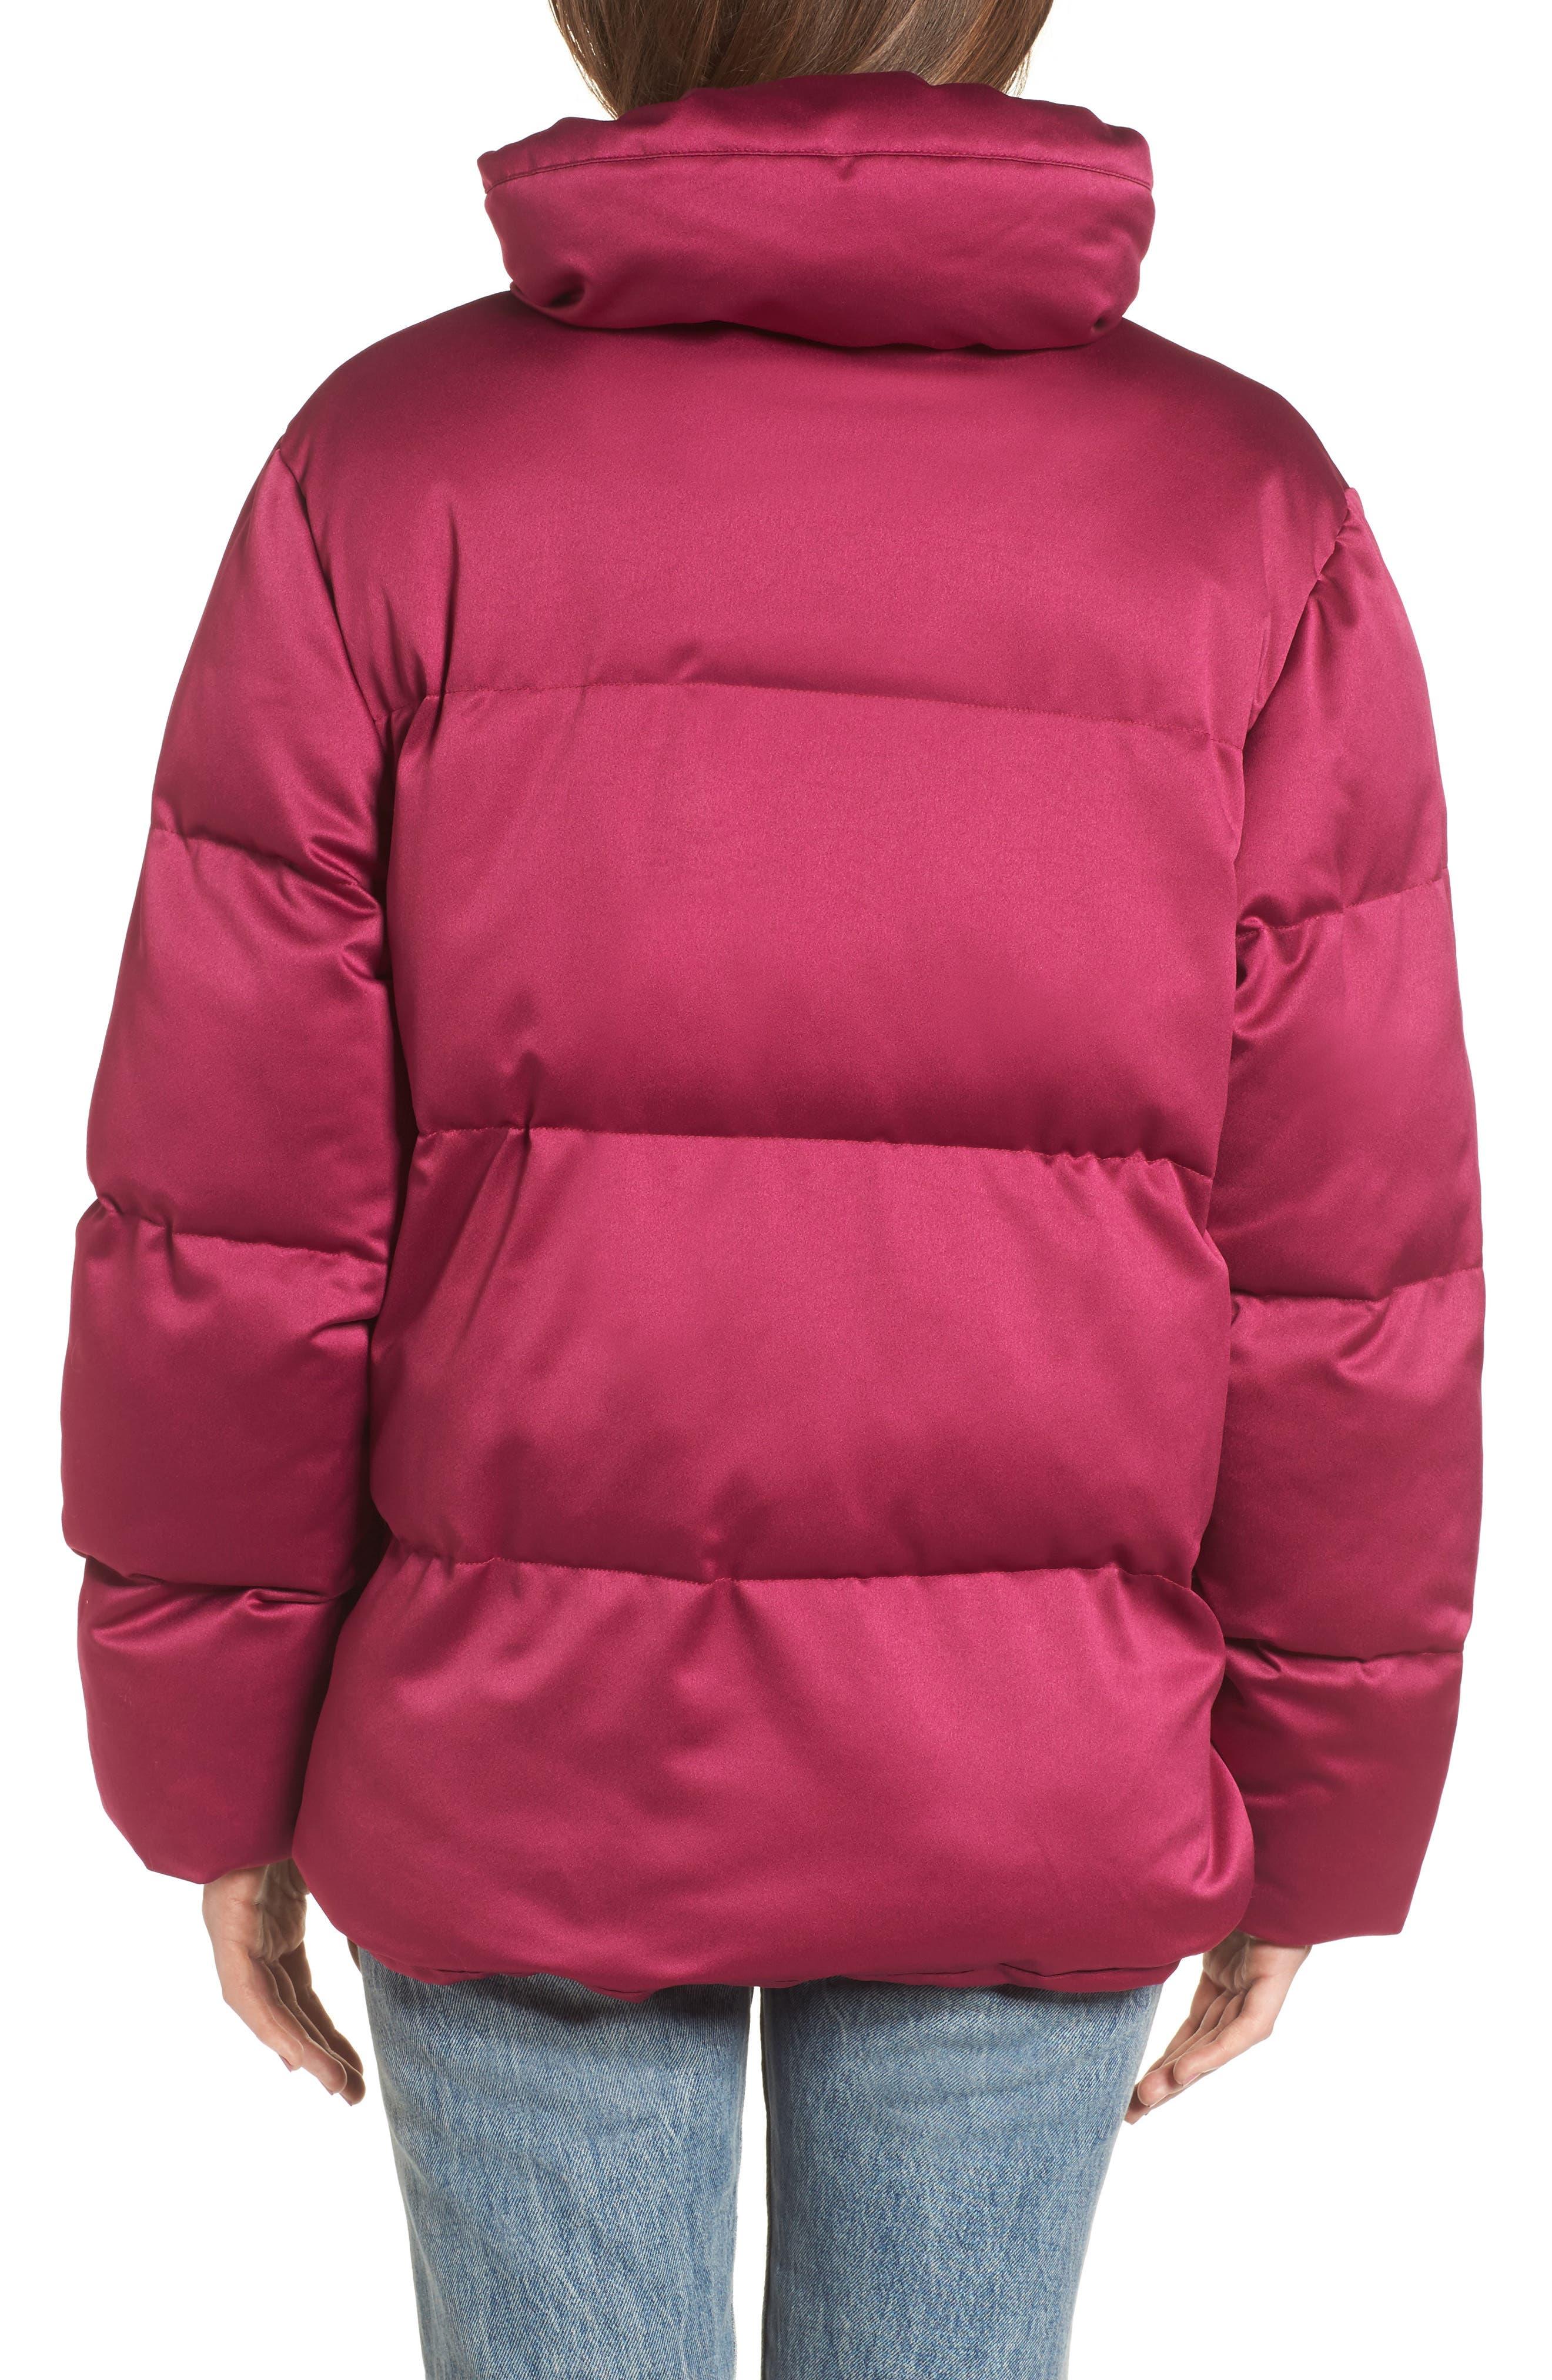 Satin Puffer Jacket,                             Alternate thumbnail 2, color,                             Bright Pink